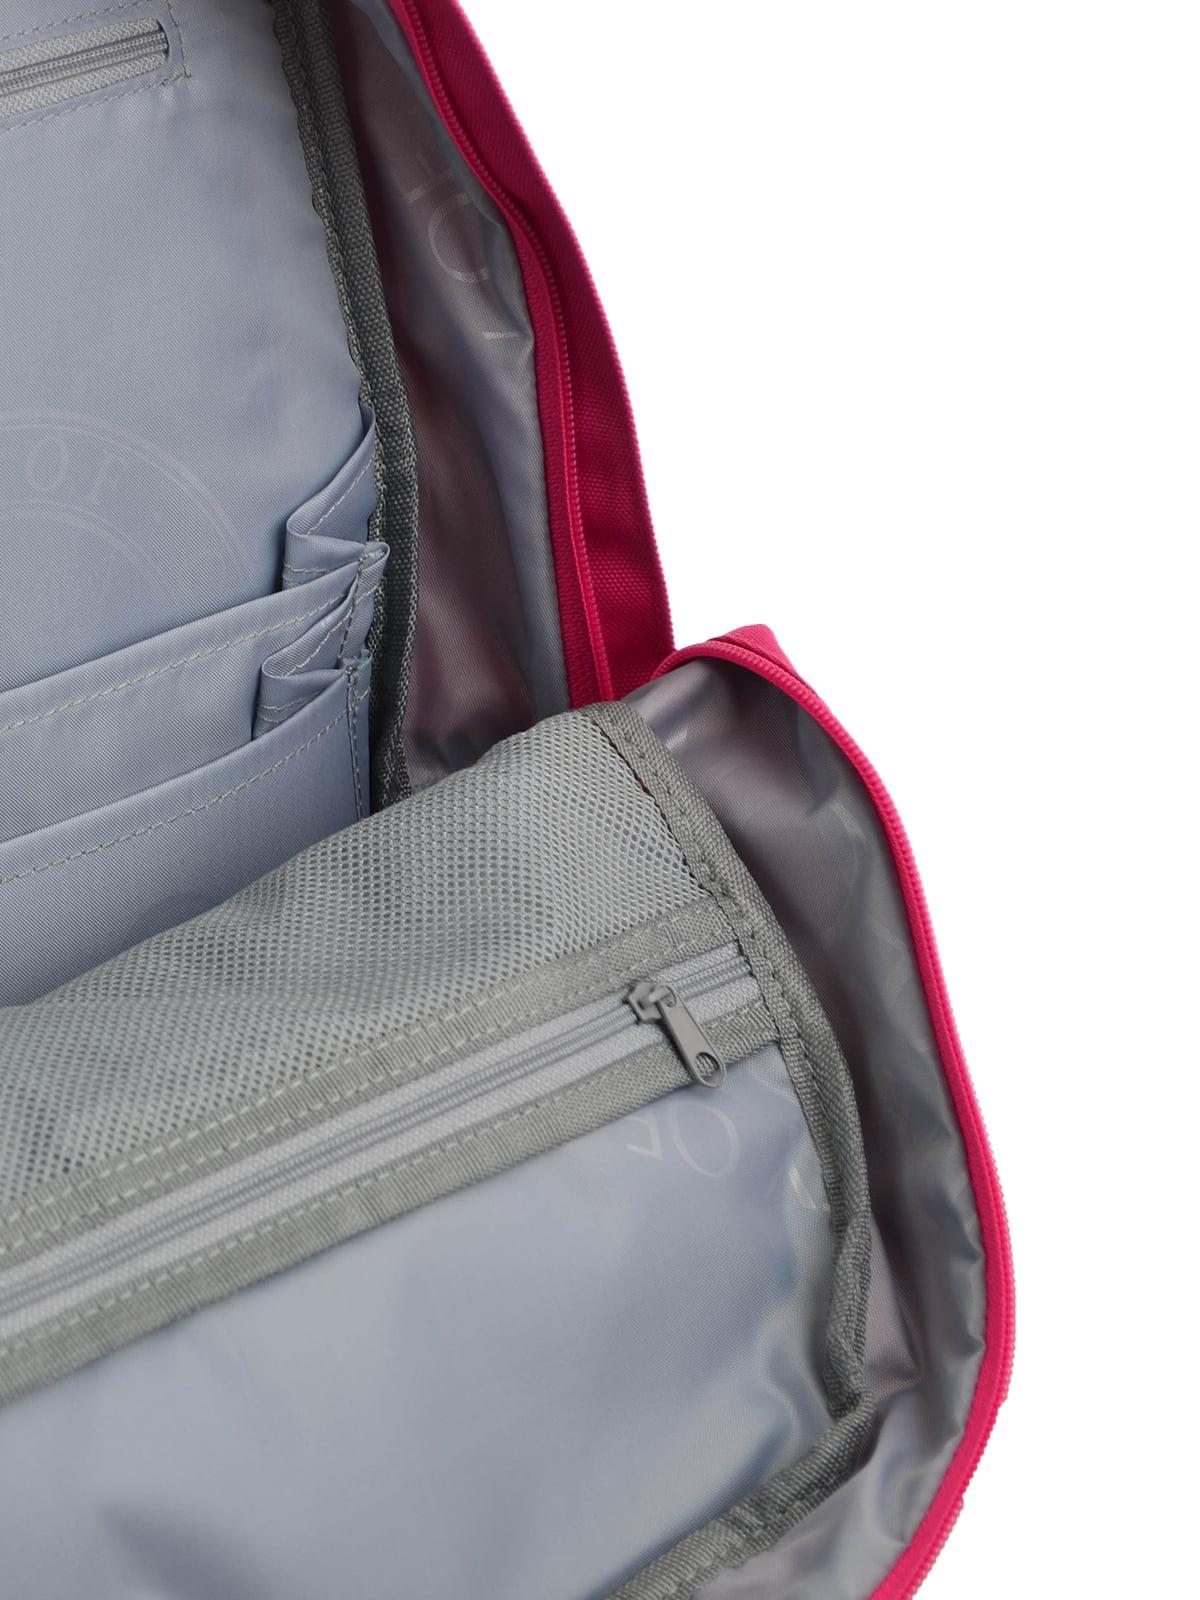 Рюкзак синьо-рожевий | 4214891 | фото 5